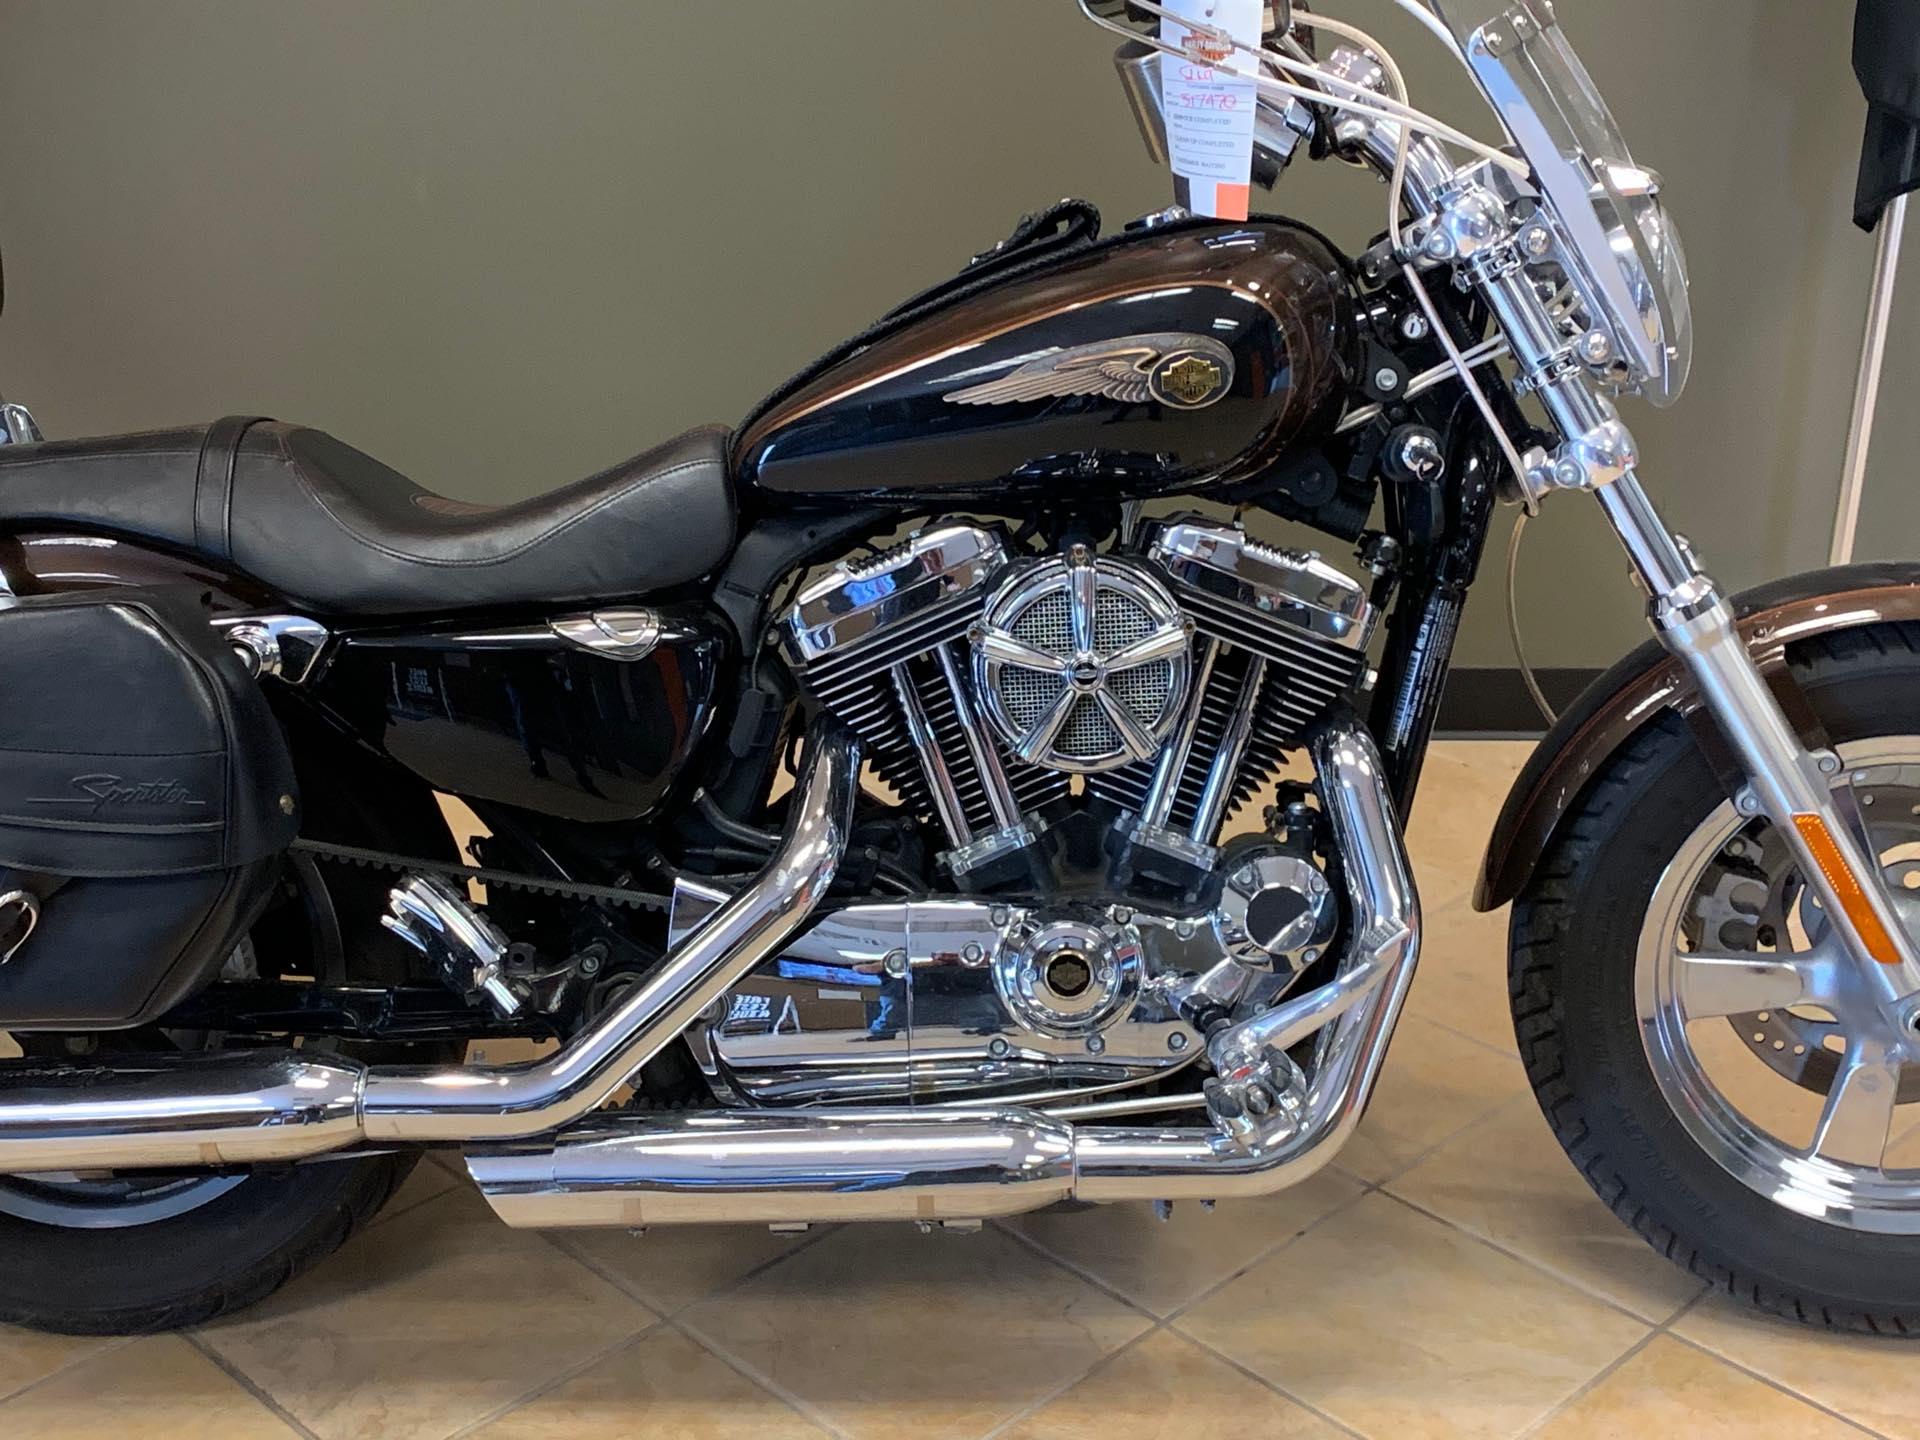 2013 Harley-Davidson Sportster 1200 Custom 110th Anniversary Edition at Loess Hills Harley-Davidson